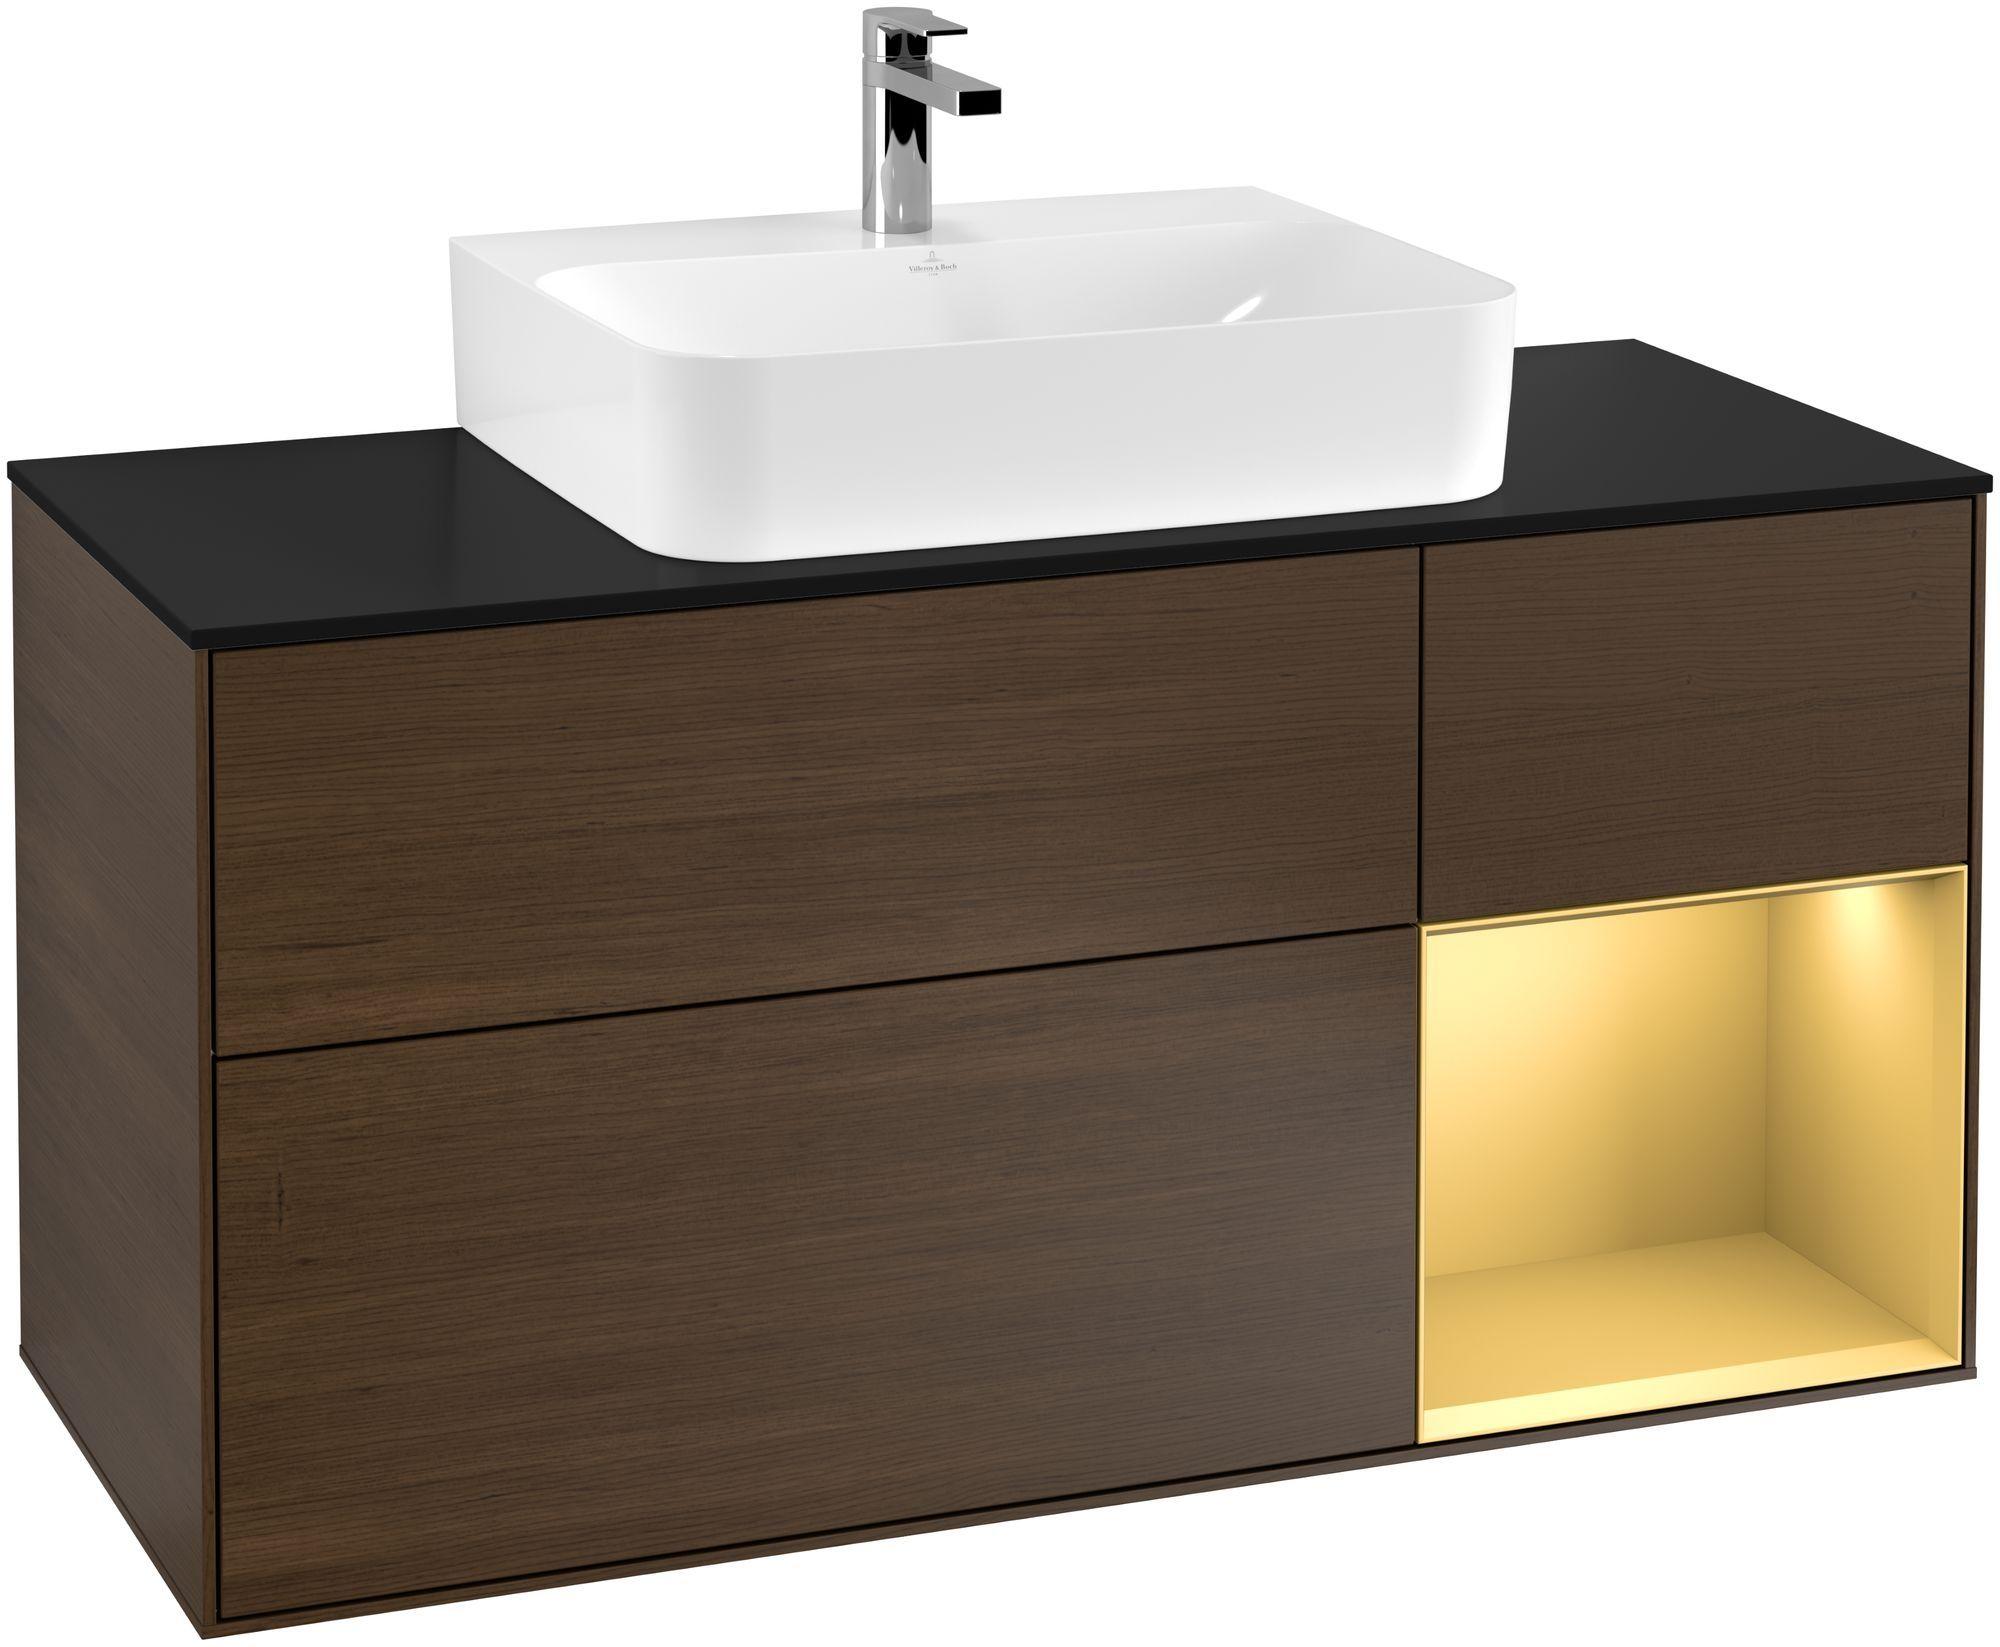 Villeroy & Boch Finion F17 Waschtischunterschrank mit Regalelement 3 Auszüge Waschtisch mittig LED-Beleuchtung B:120xH:60,3xT:50,1cm Front, Korpus: Walnut Veneer, Regal: Gold Matt, Glasplatte: Black Matt F172HFGN